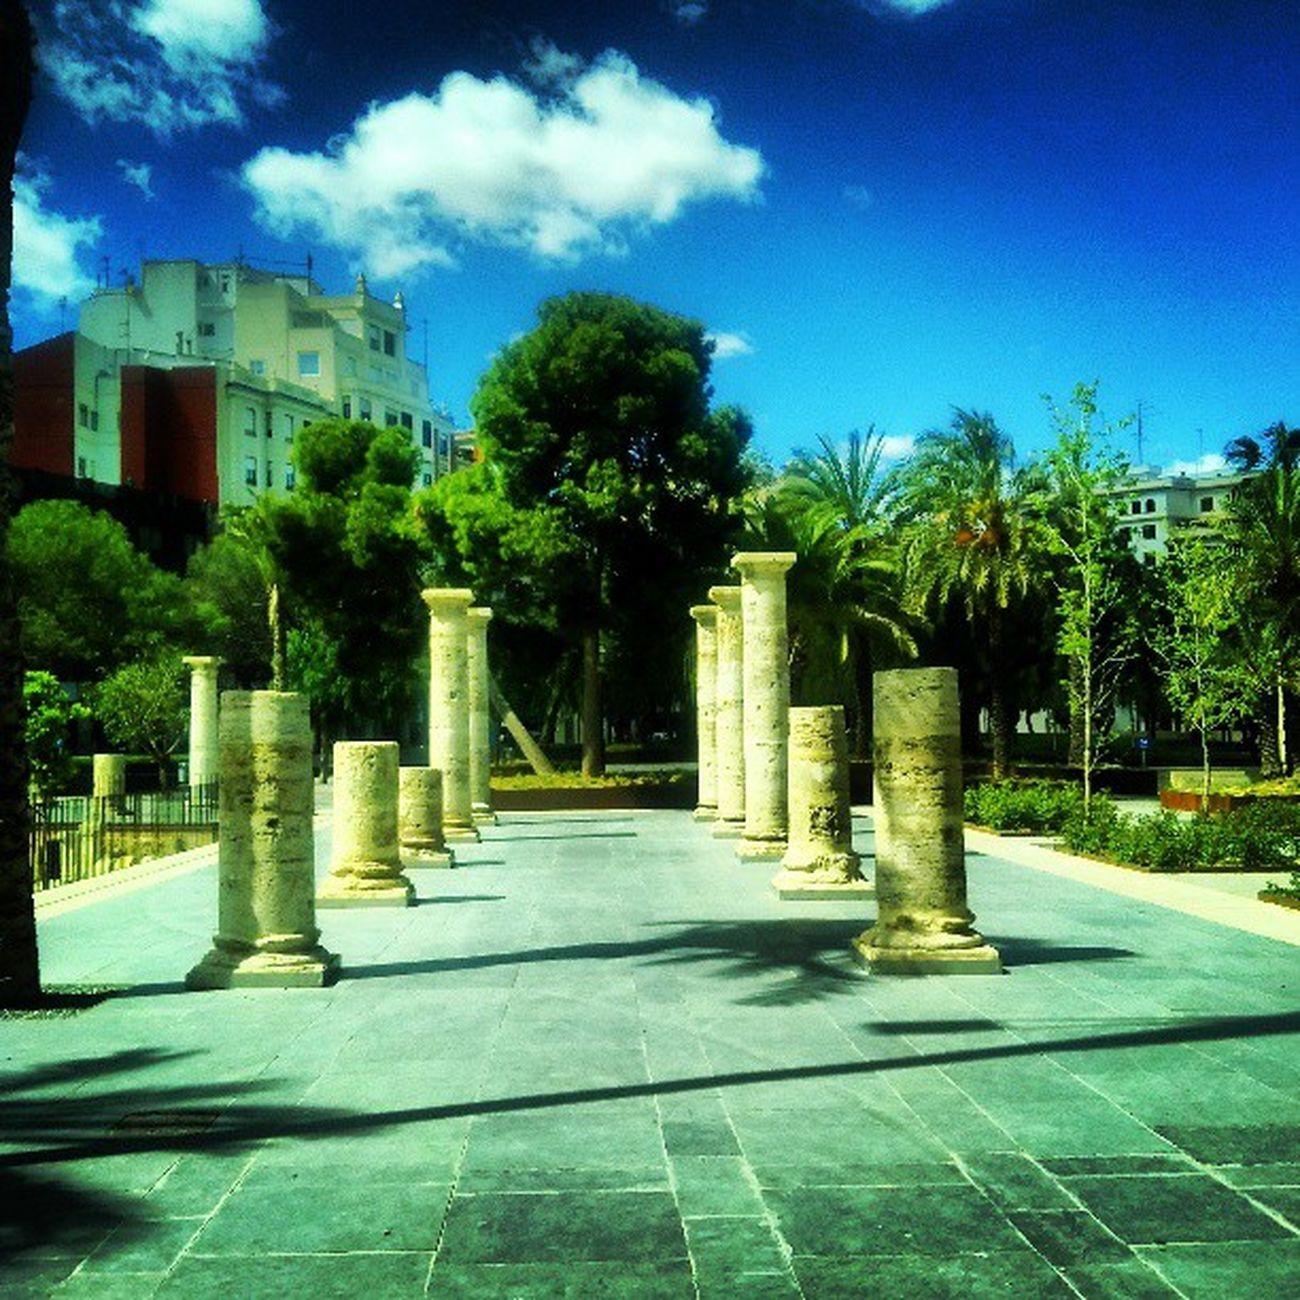 #RuinasRomanas #Valencia #historia València Historia Ruinasromanas